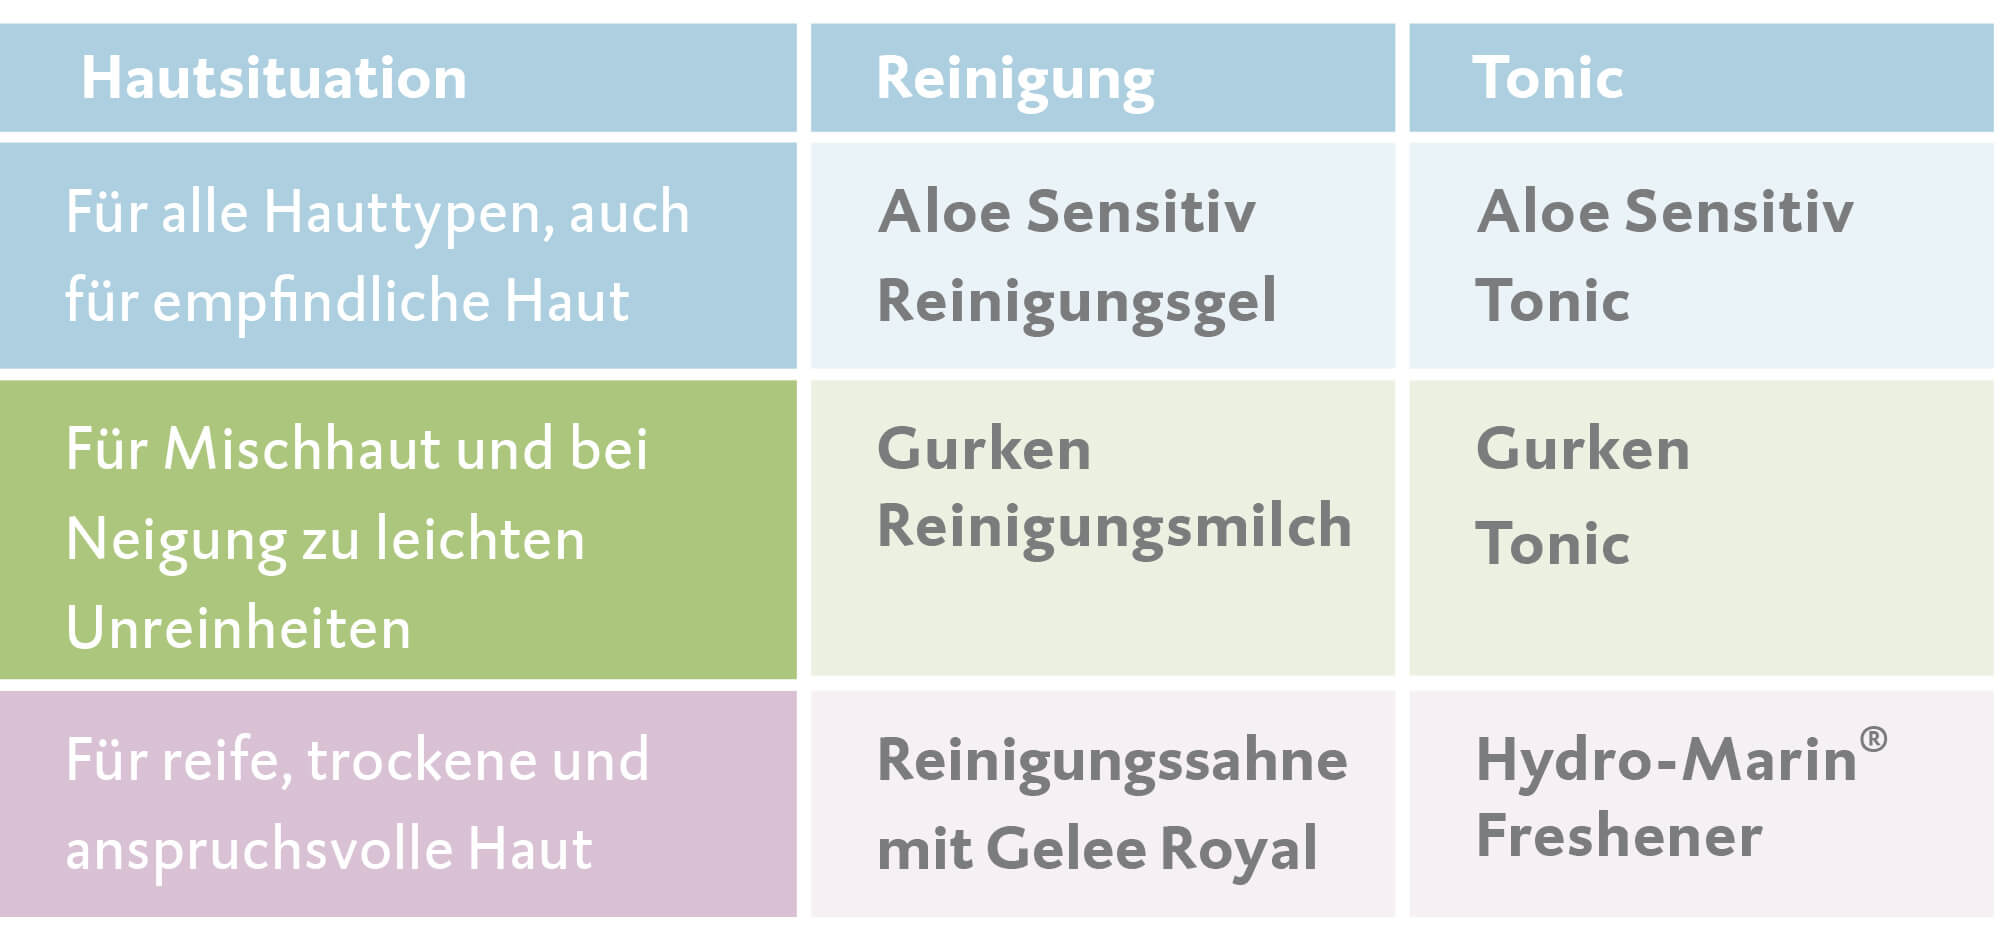 Drspiller_cleansing_duos-uebersicht